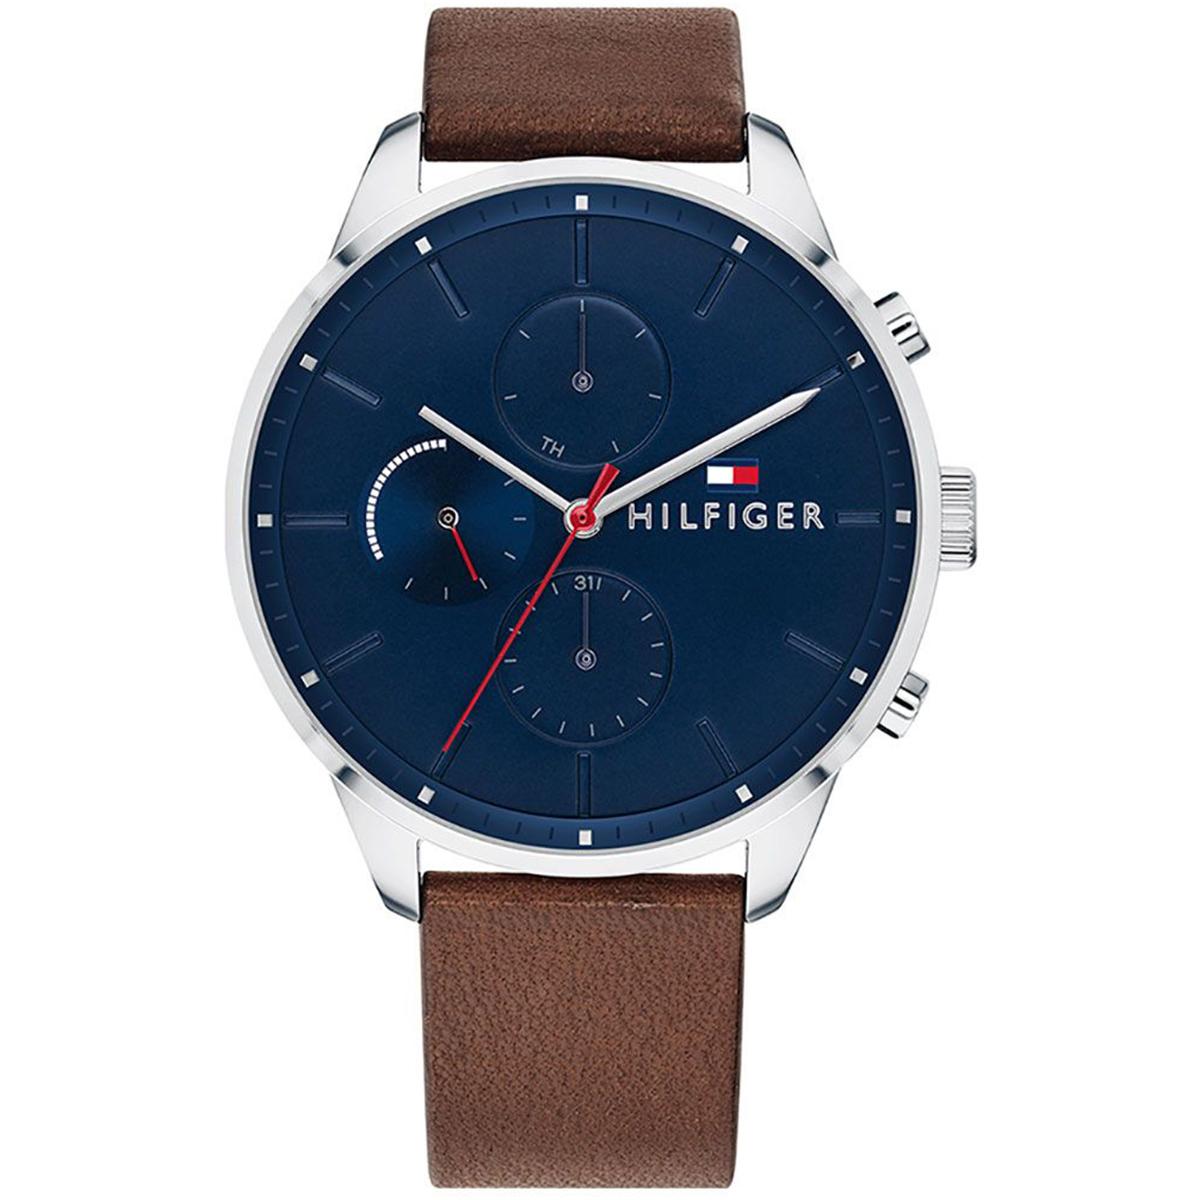 TOMMY HILFIGER トミーヒルフィガー 時計 倉 腕時計 送料無料 メンズ 全品送料無料 クォーツ 1791487 ブランド 海外限定 アナログ